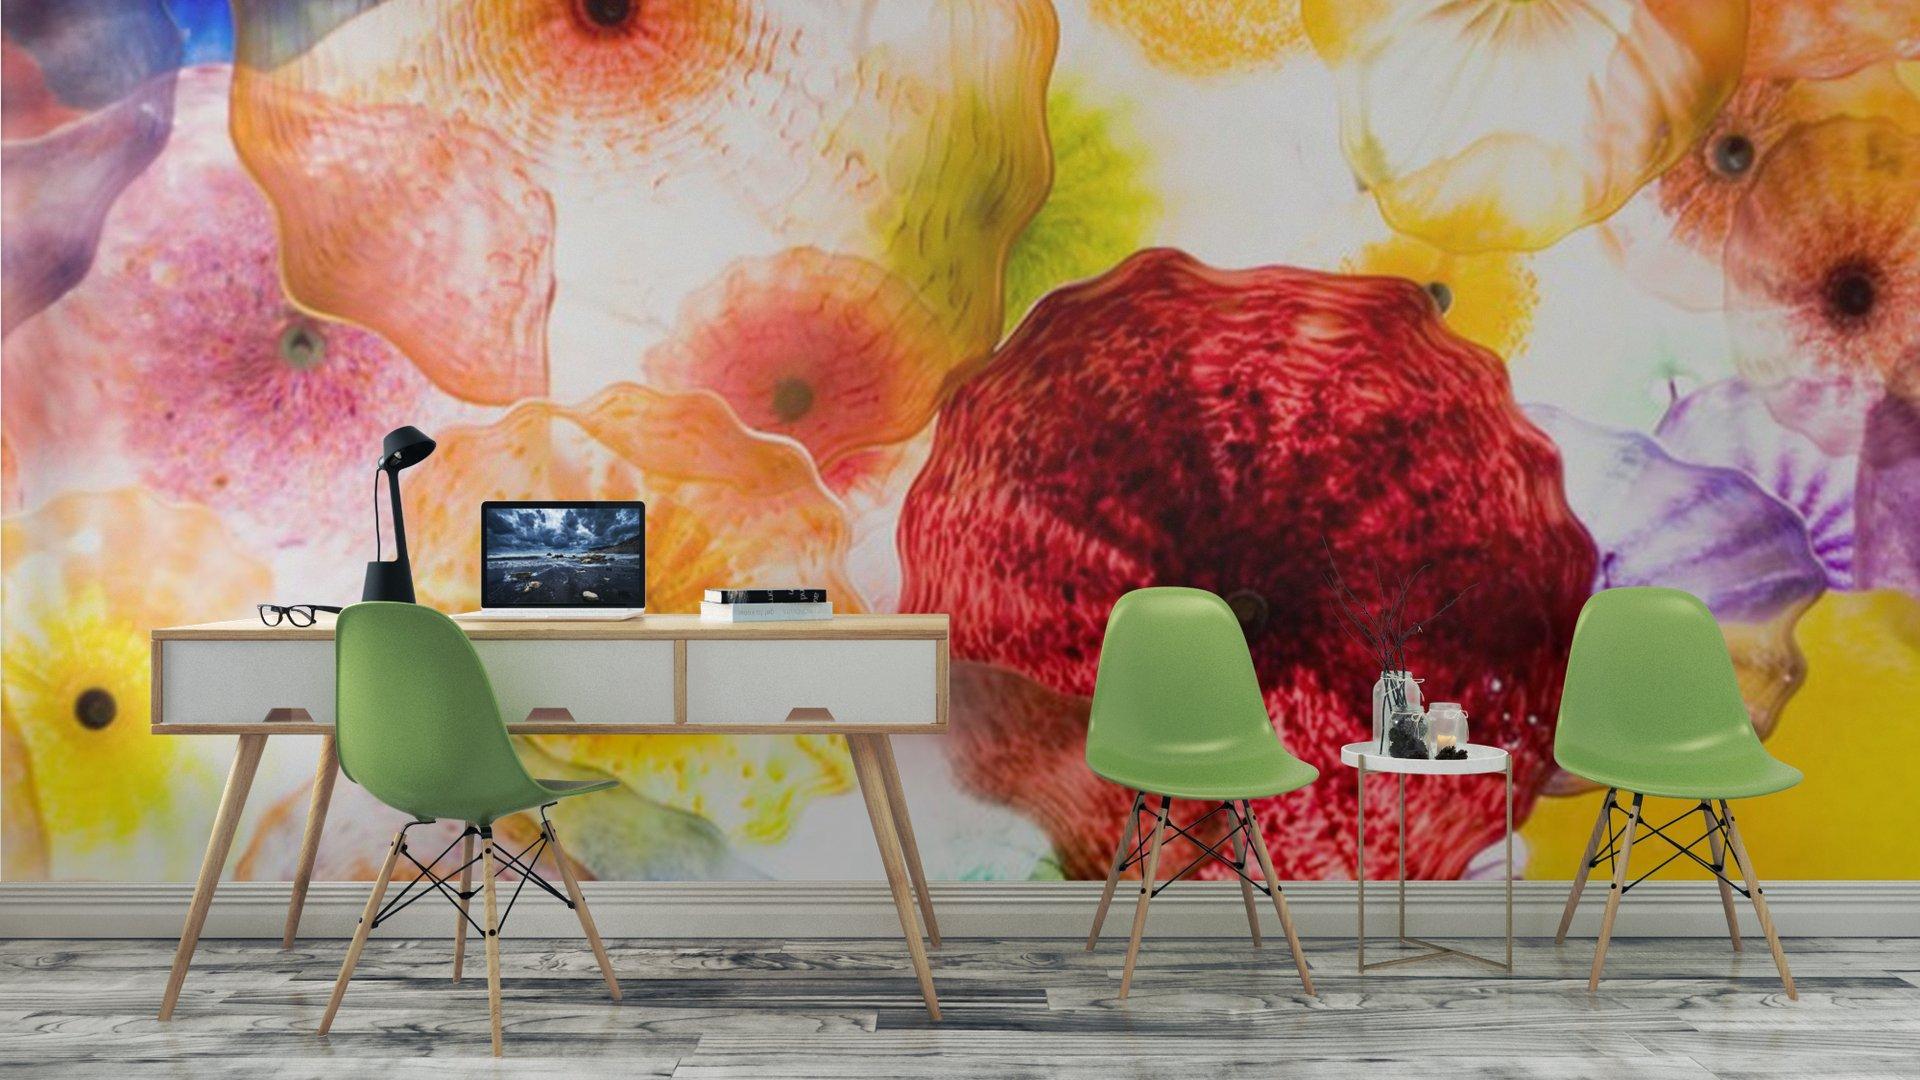 ARTE EN VIDRIO5 - Fotomural Tapiz Patrón Floral 01